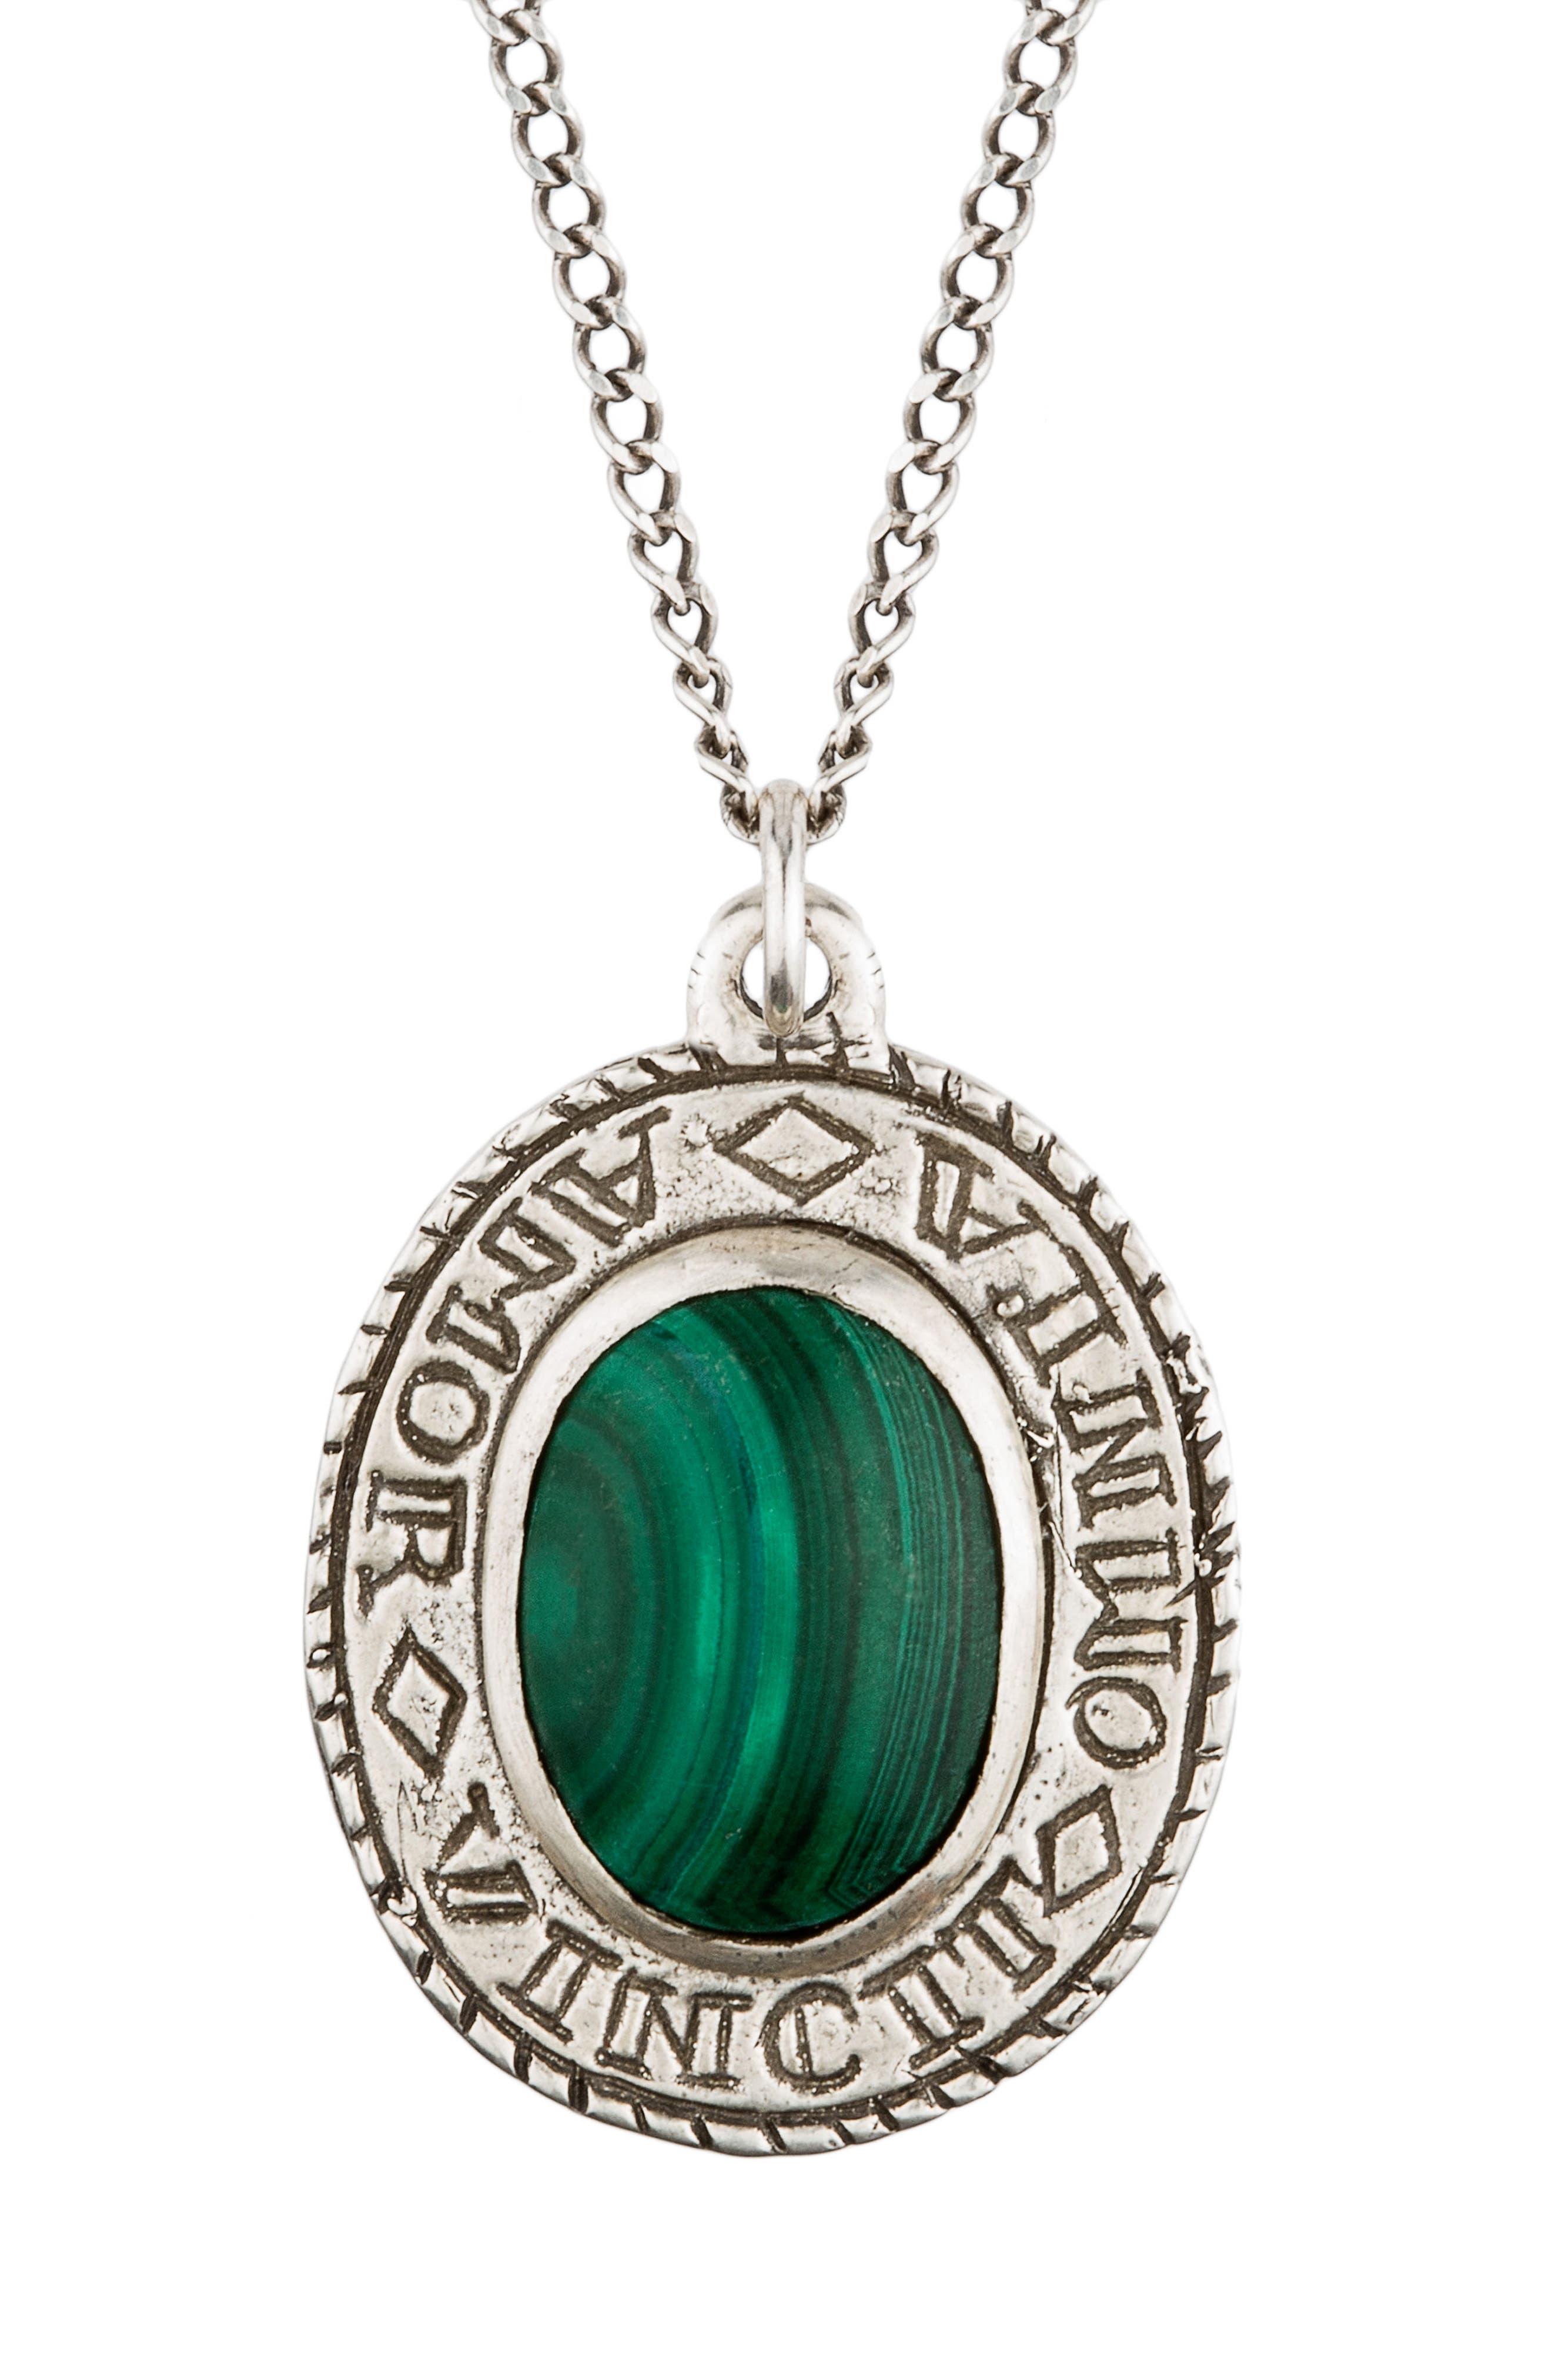 Main Image - Lewis Henry Nicholas Amor Sterling Silver Pendant Necklace